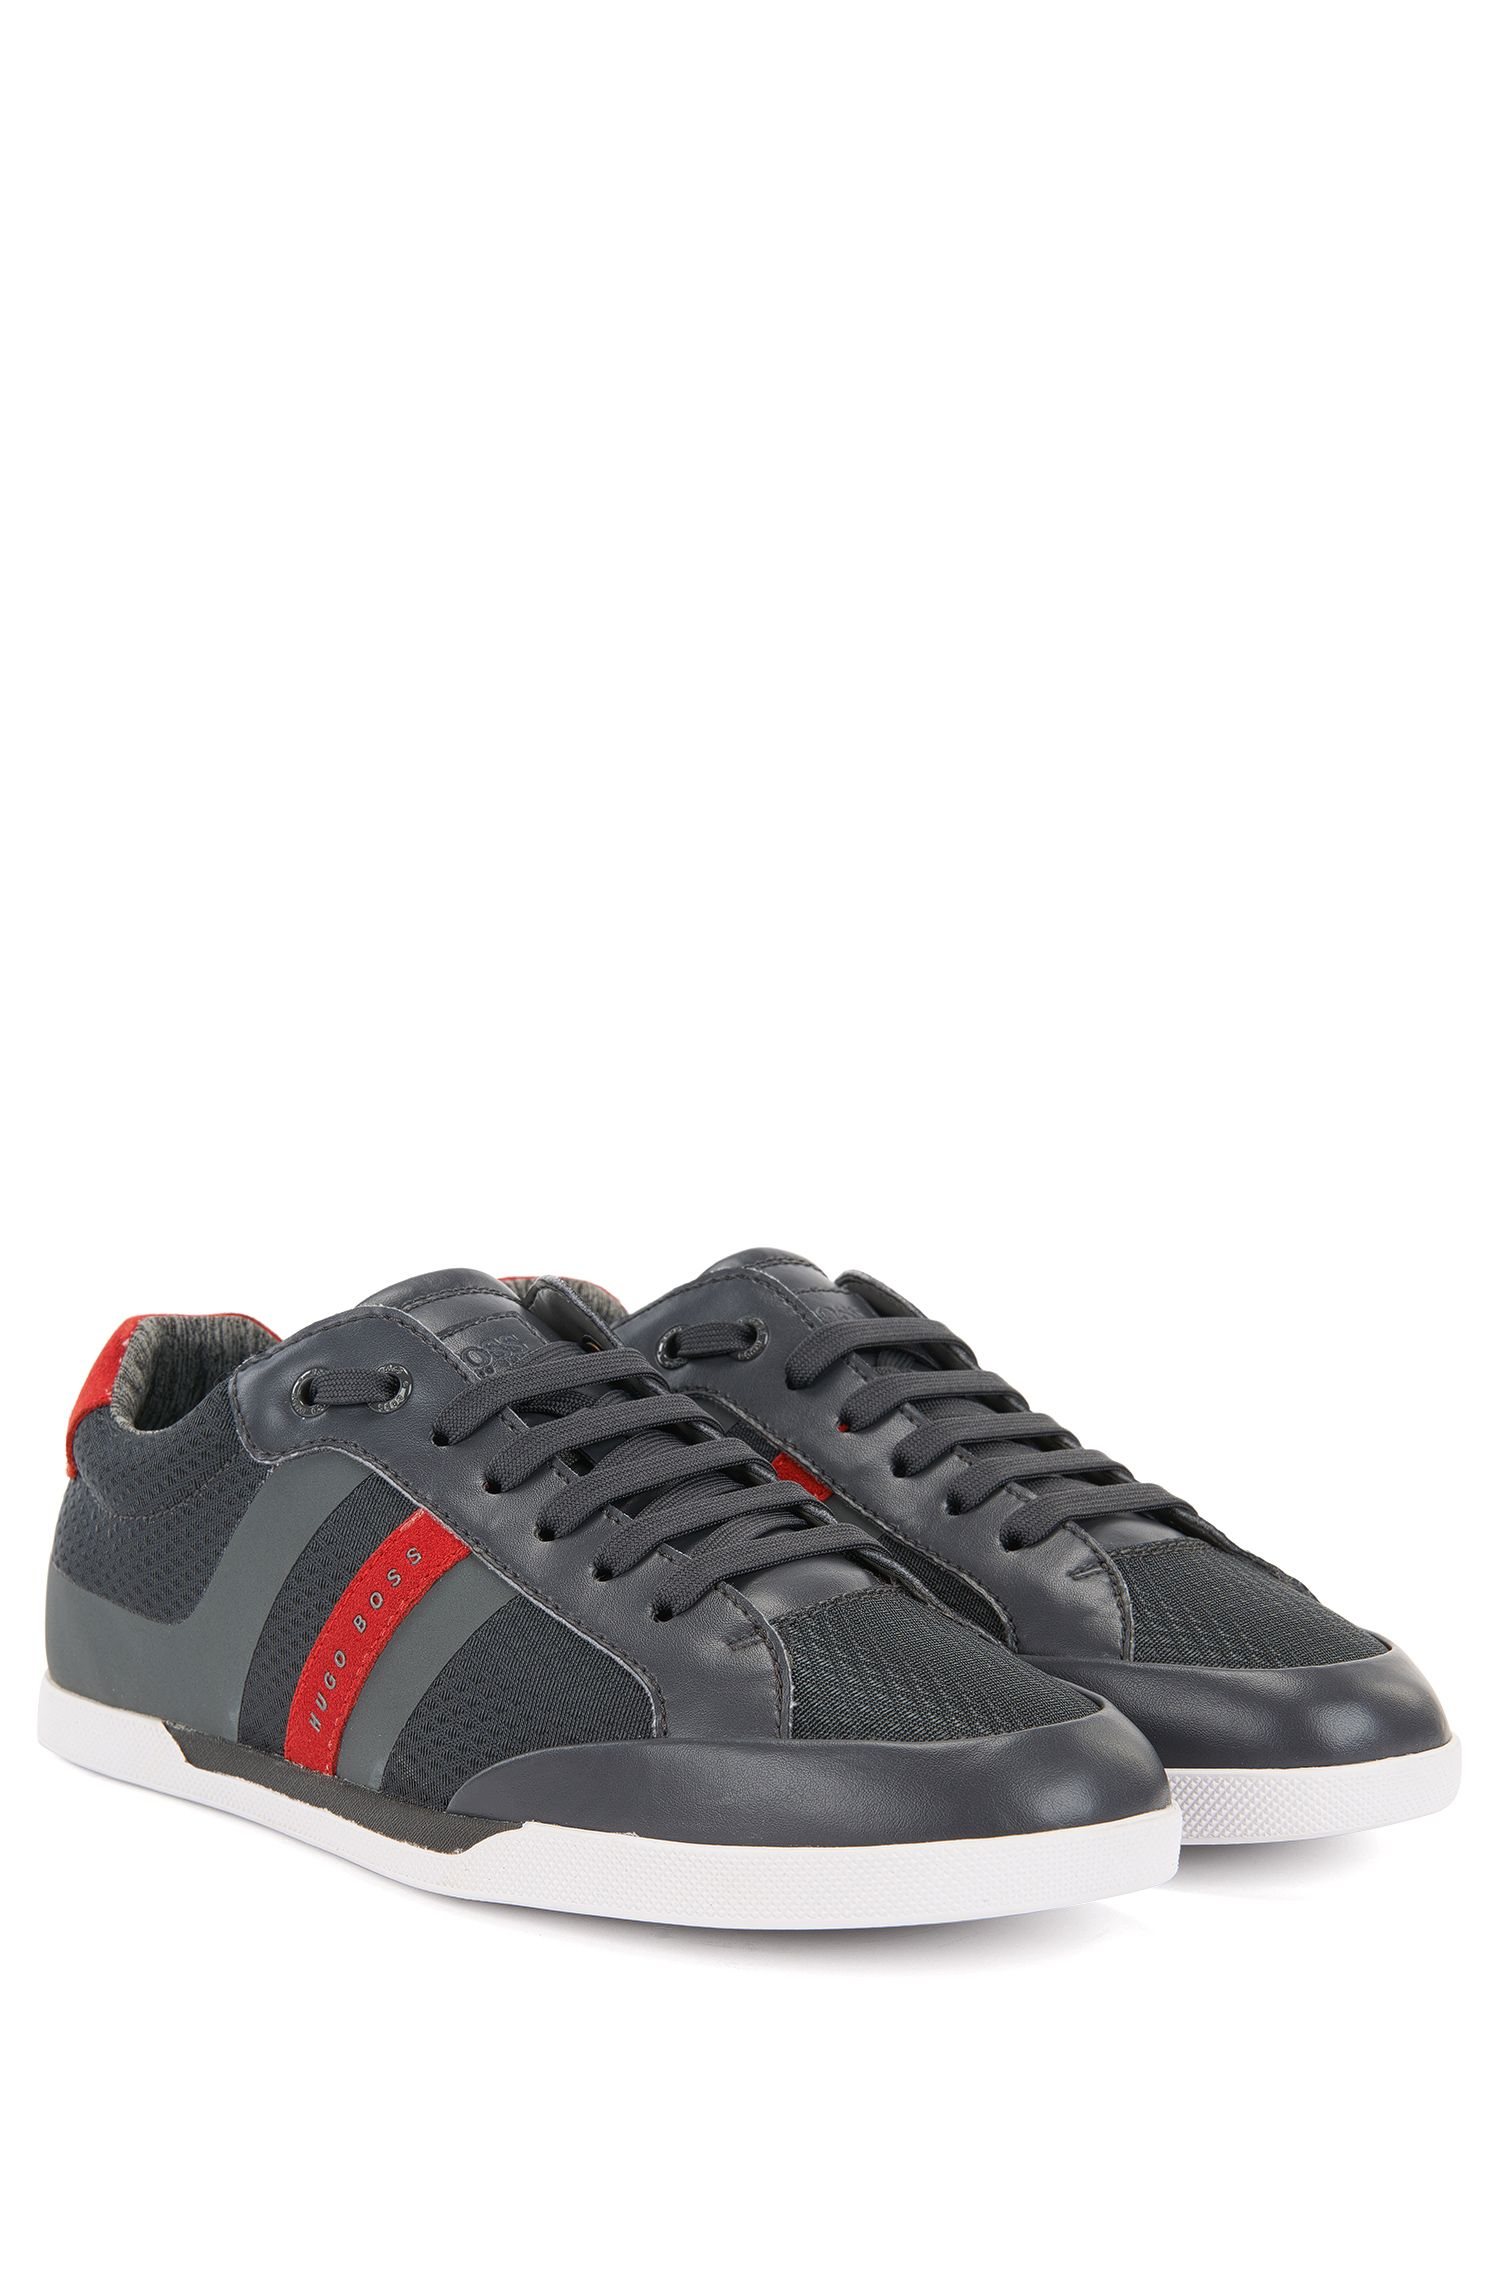 Mesh Sneaker | Shuttle Tenn It, Dark Grey